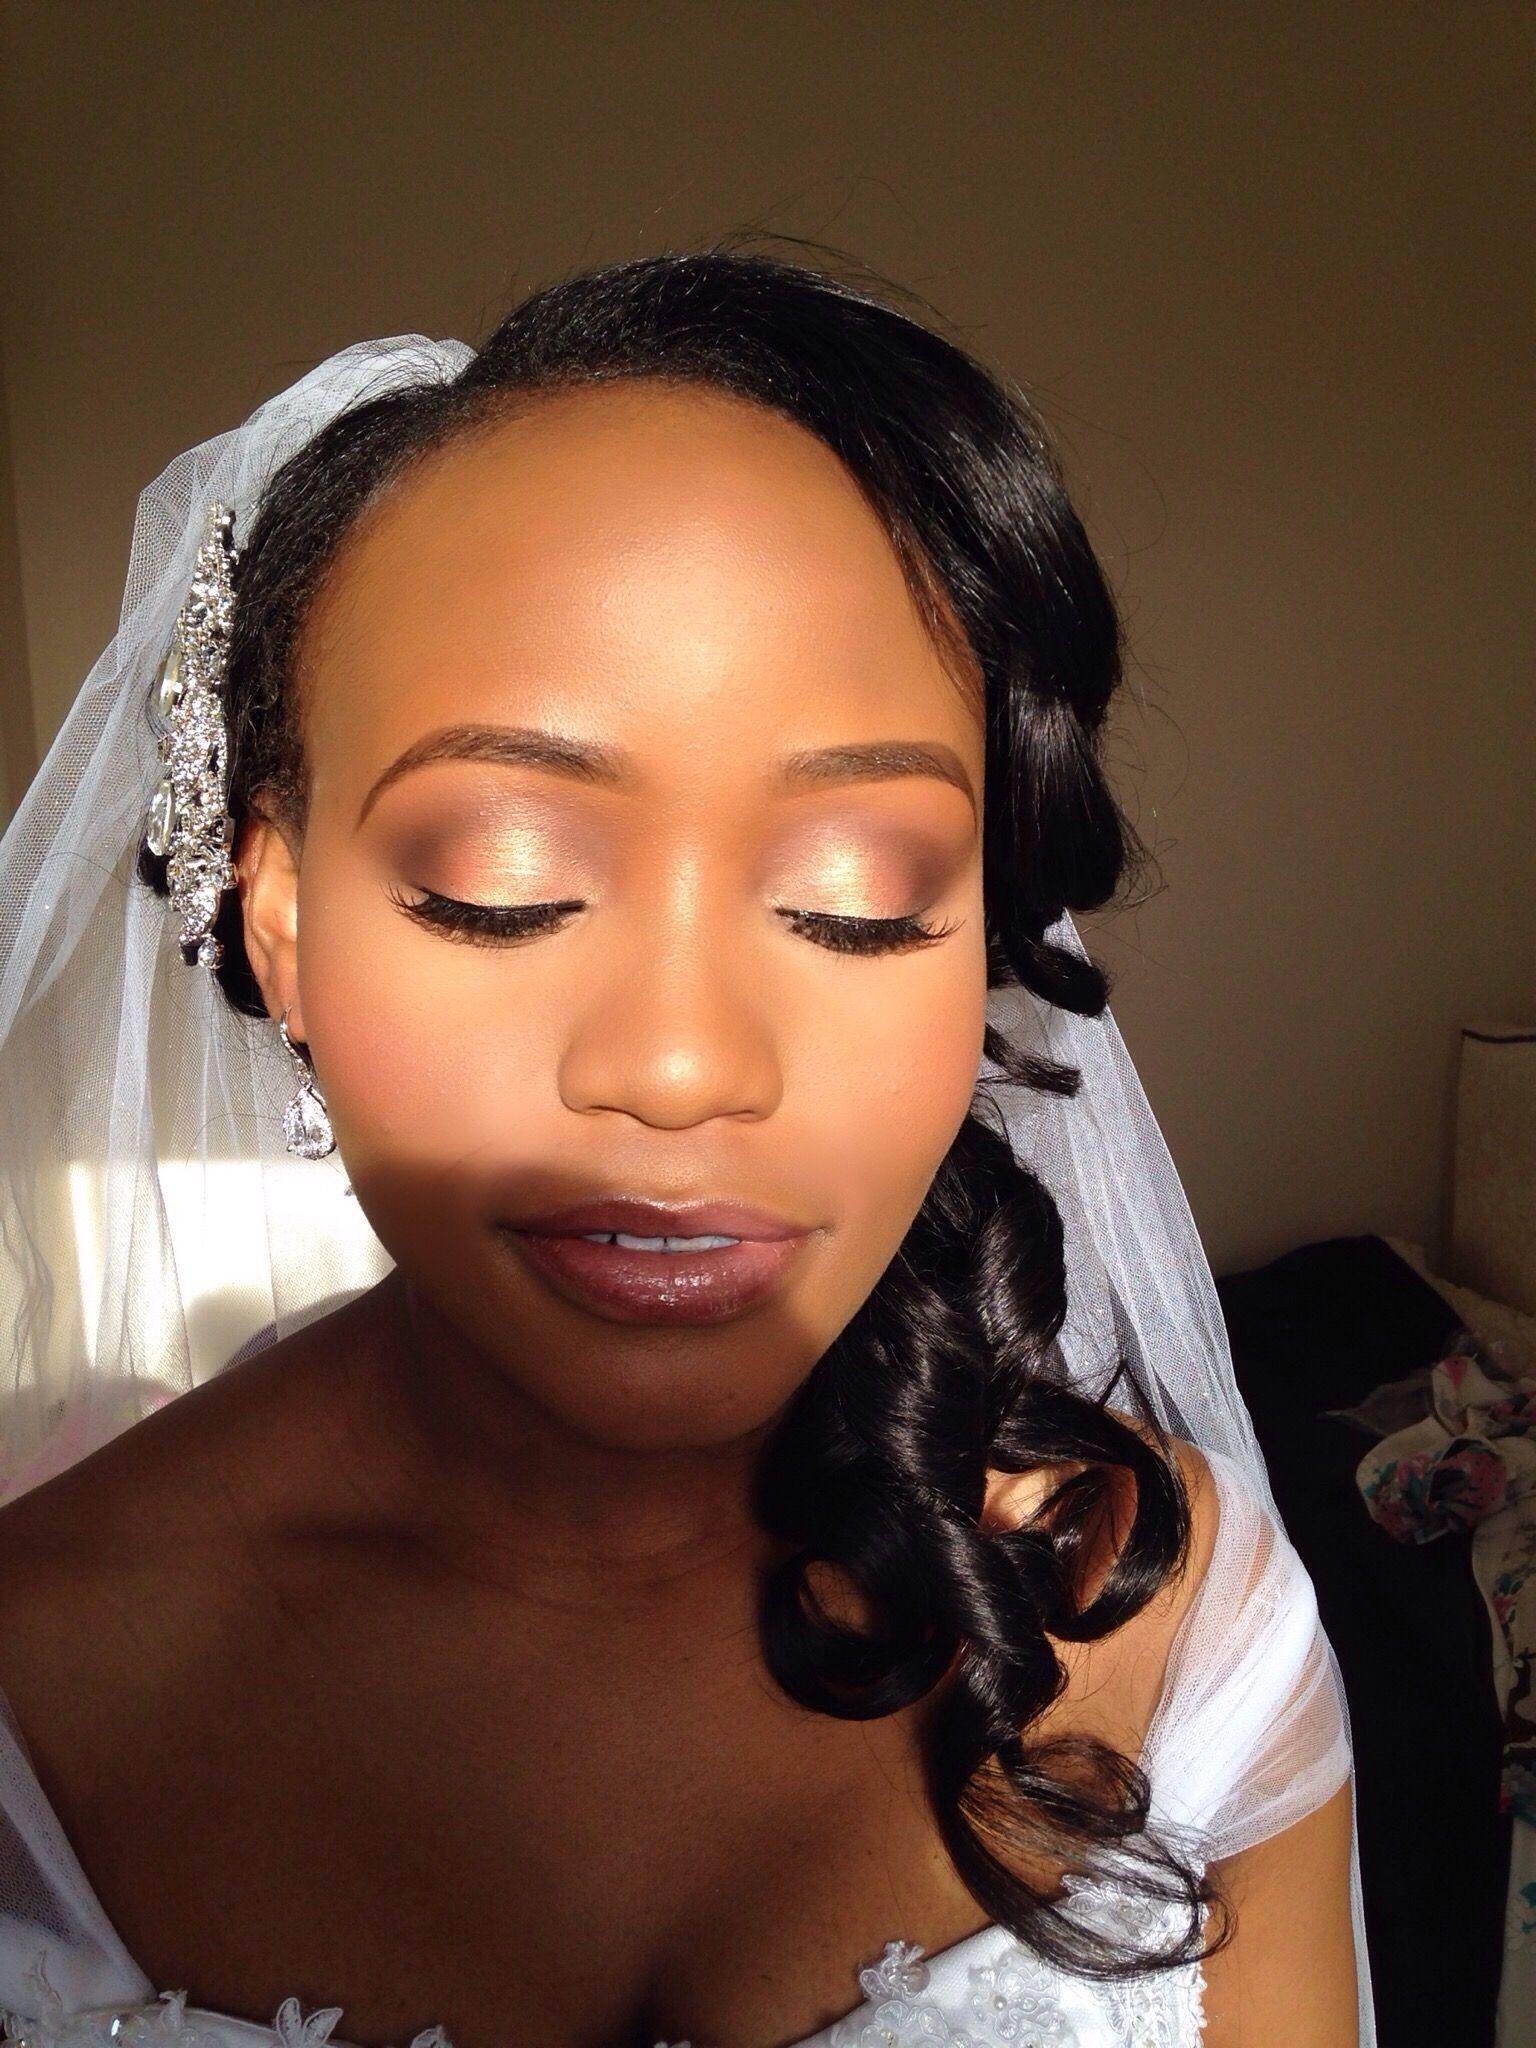 Wedding Makeup Tips For Dark Skin : black makeup artist london, makeup artist for black skin ...